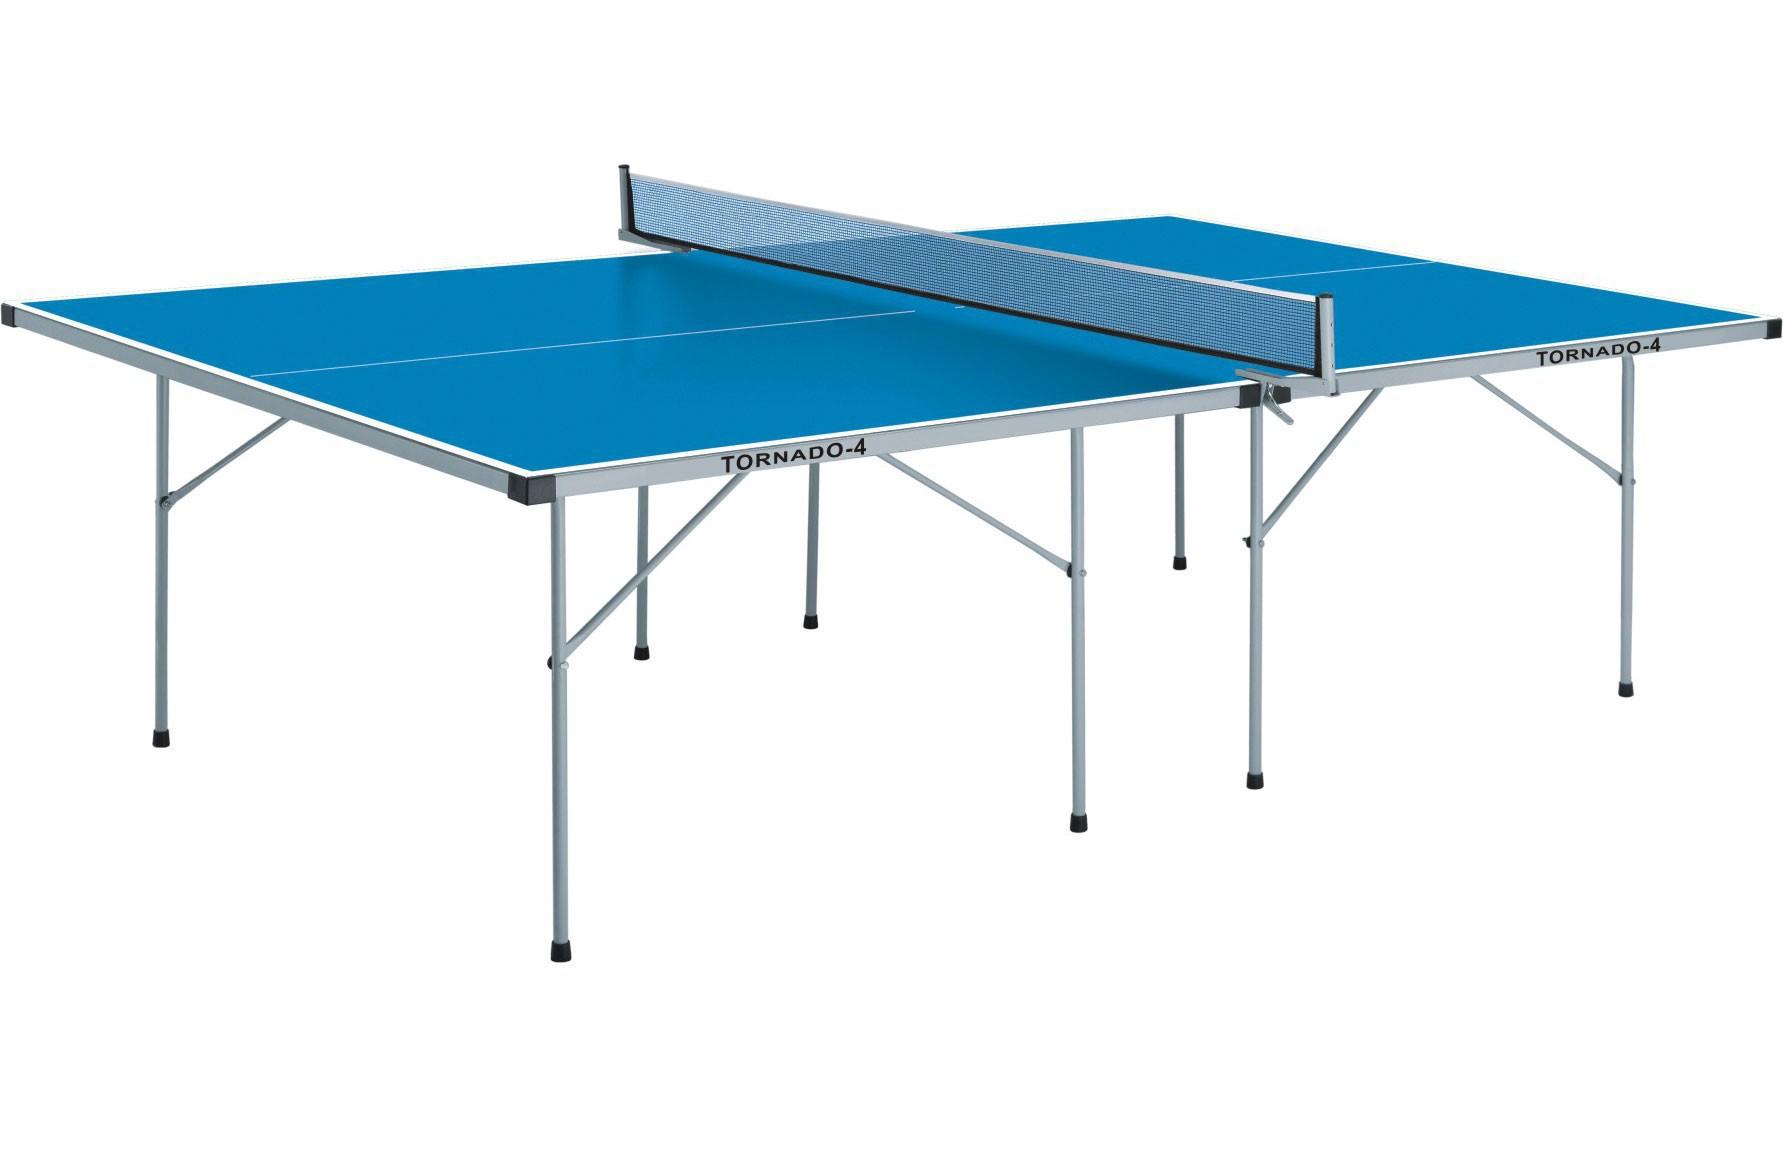 Арт. - Всепогодный теннисный стол Donic TORNADO-4 синий, 23990 рублей<a class='btn btn-primary btn-xs' style='margin-left:7px;' href='https://relaxtorg.ru/Vsepogodnyy-tennisnyy-stol-Donic-TORNADO-4-siniy '> Cмотреть </a>